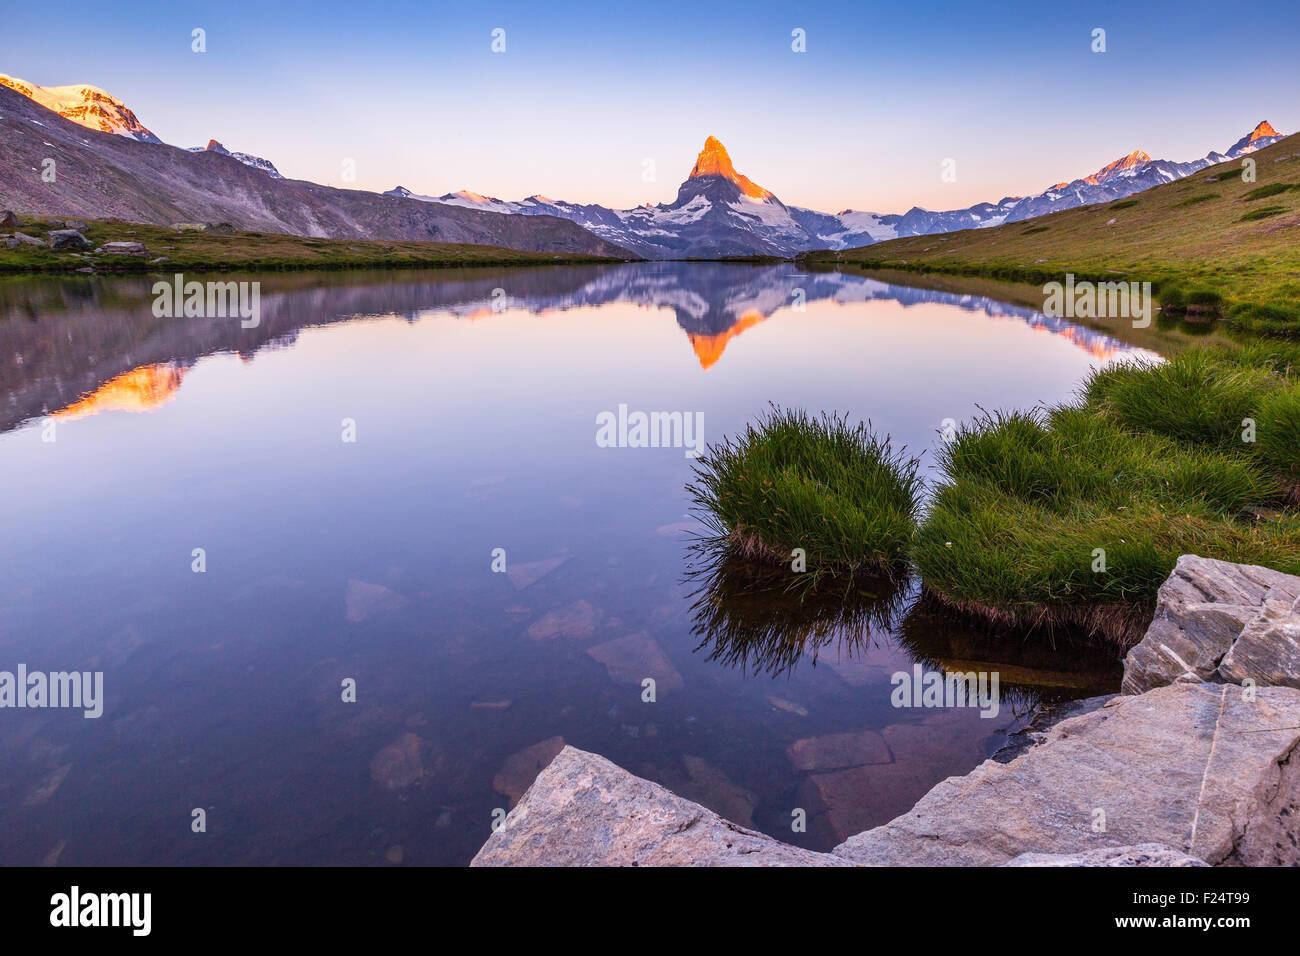 Sunrise on Mt.Matterhorn (Cervino).  Lake Stellisee, Zermatt, Switzerland - Stock Image